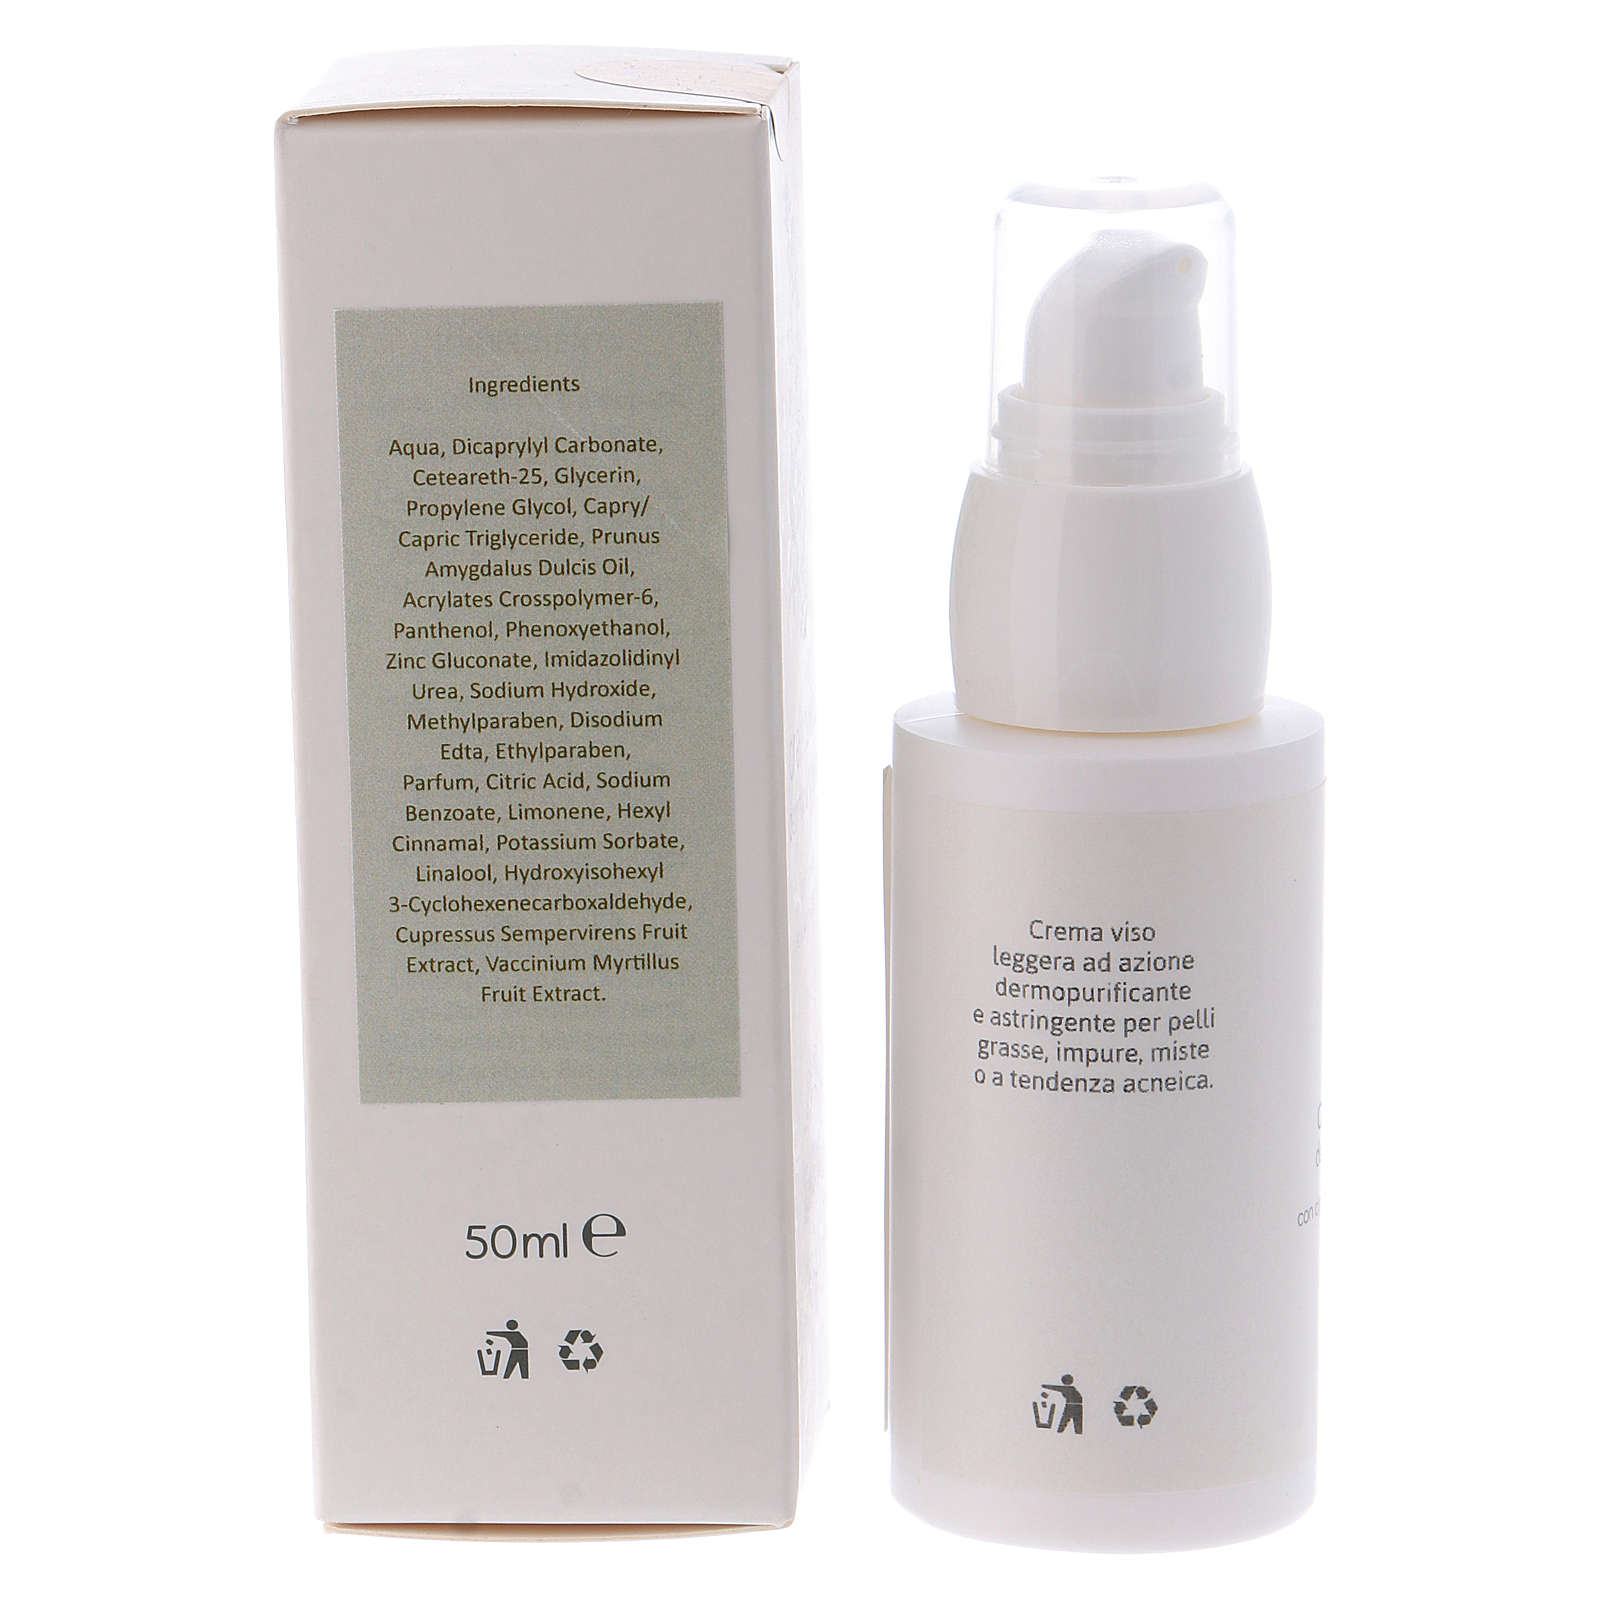 Skin purifying face cream 50ml  Valserena 4